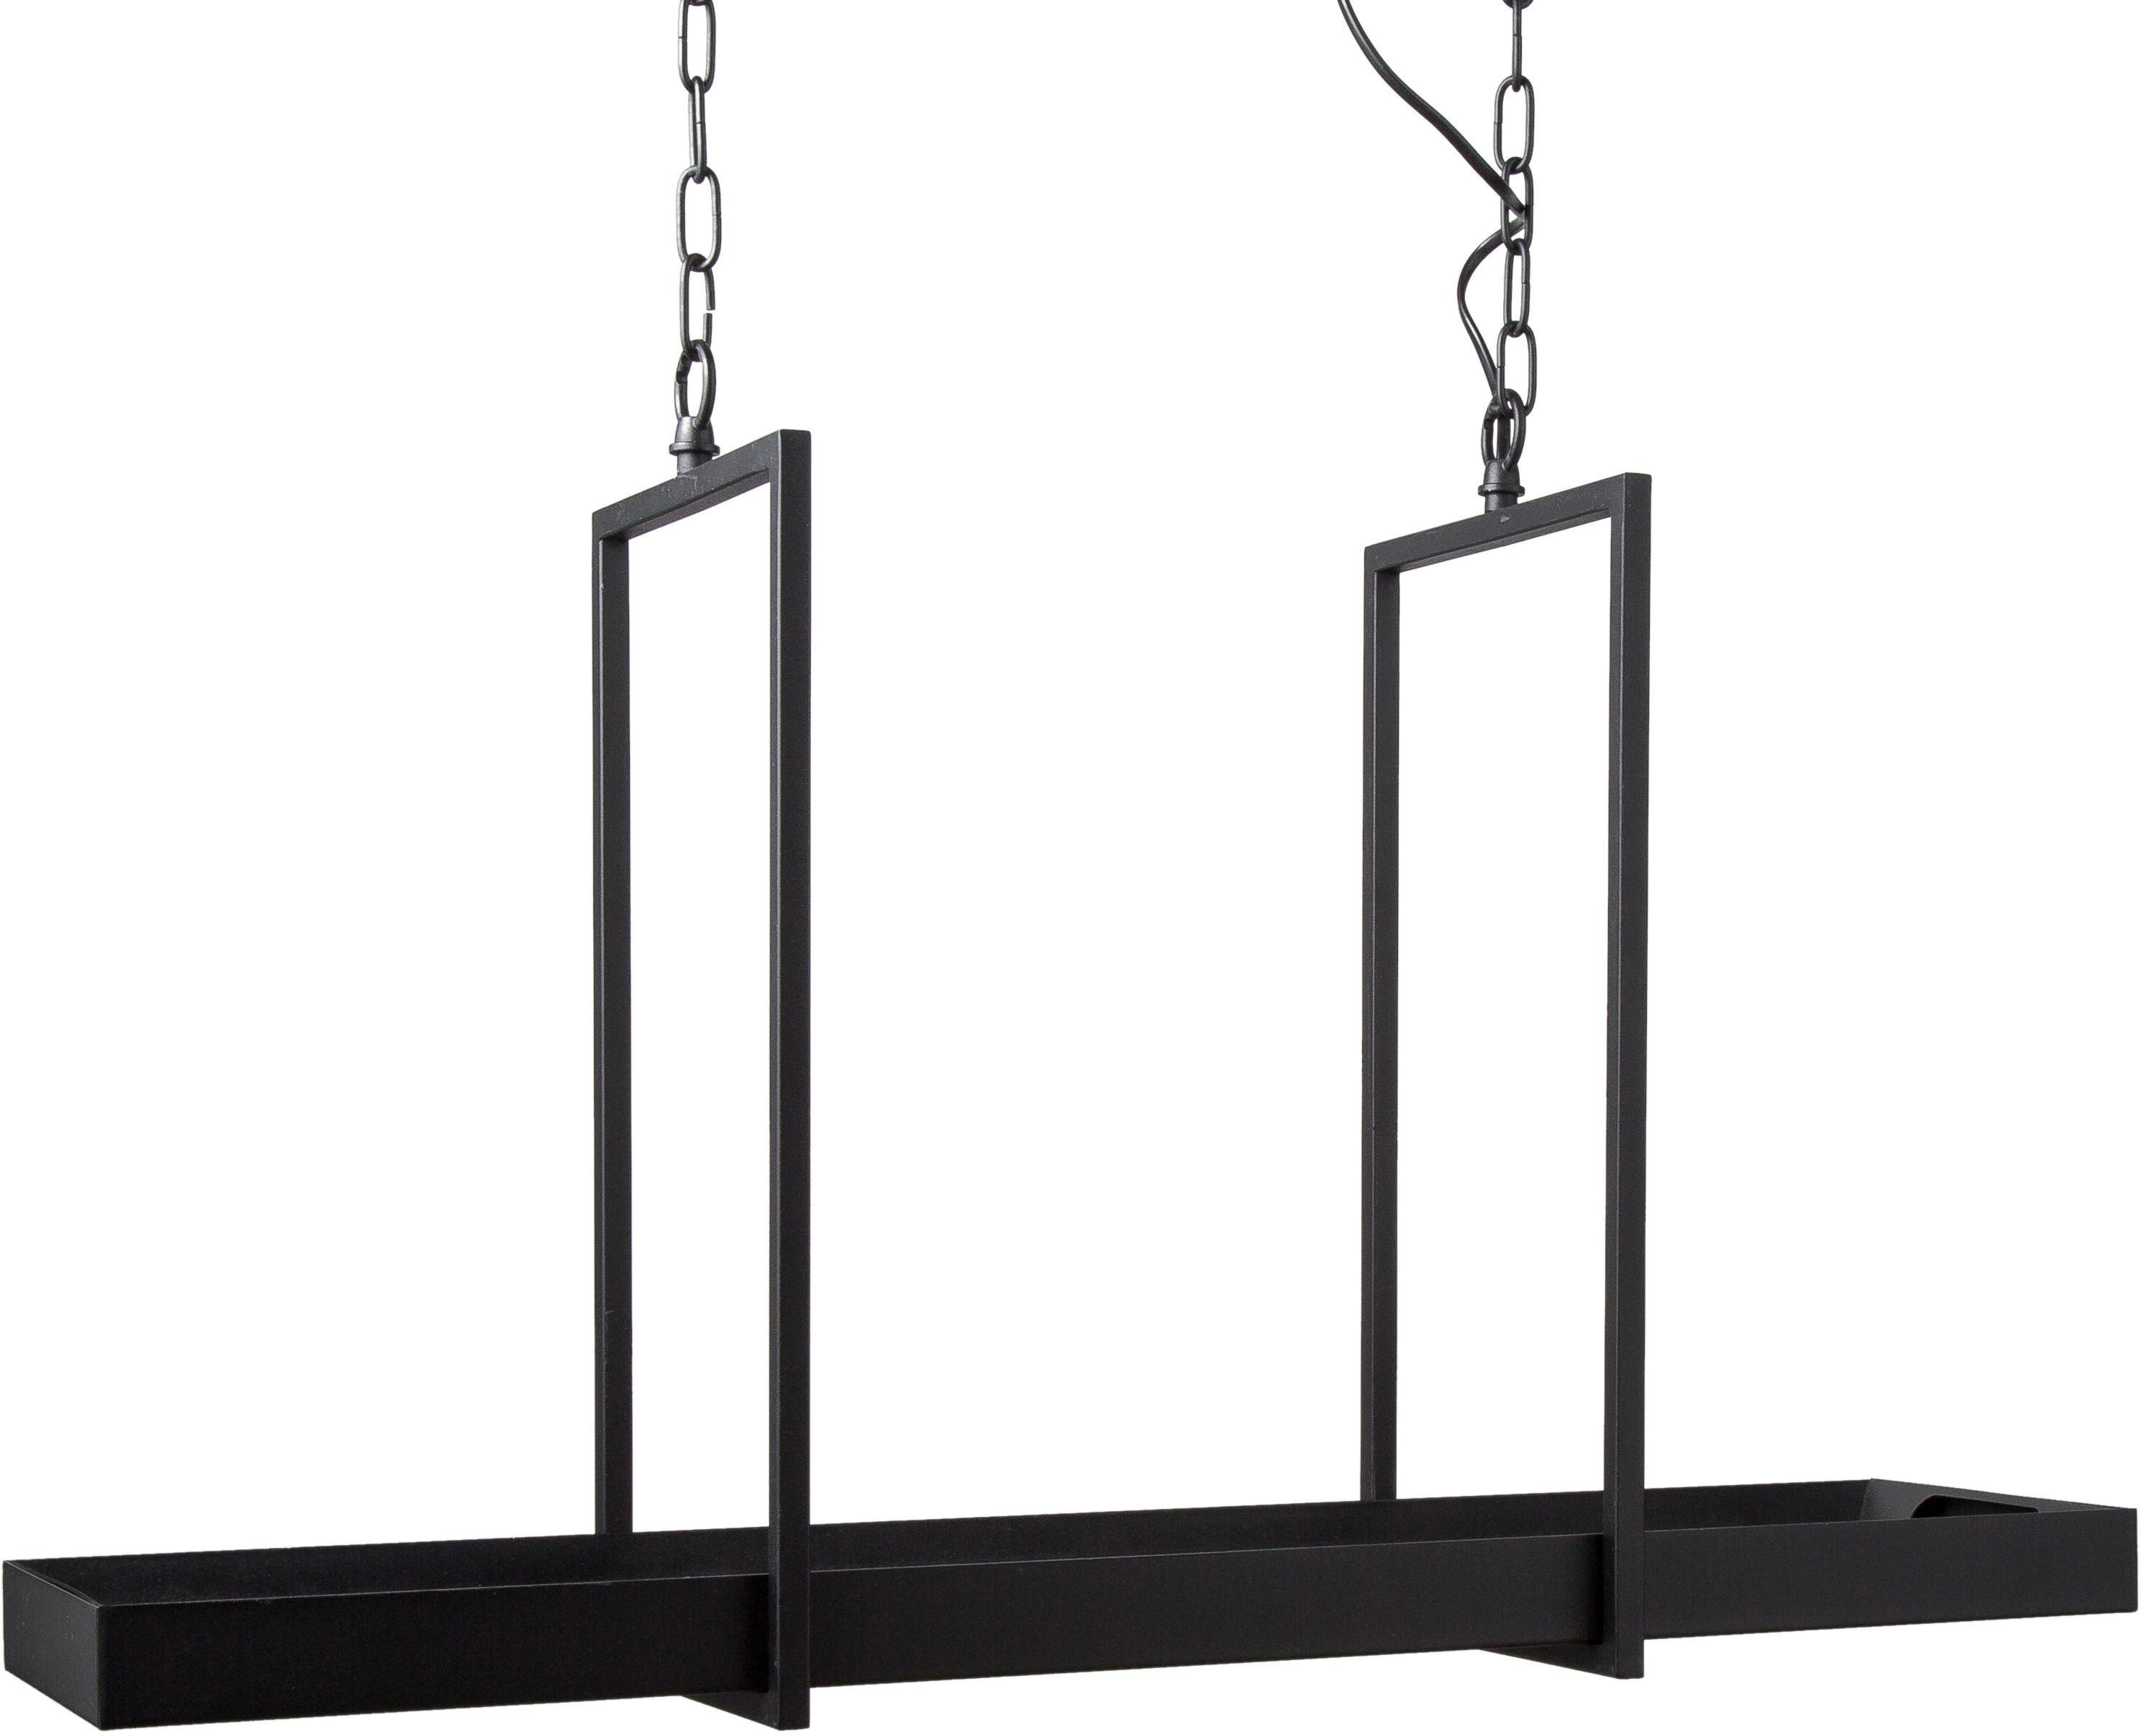 Große LED Pendelleuchte Tray im Industrial-Style, Metall, lackiert, Schwarz, 80 x 50 cm